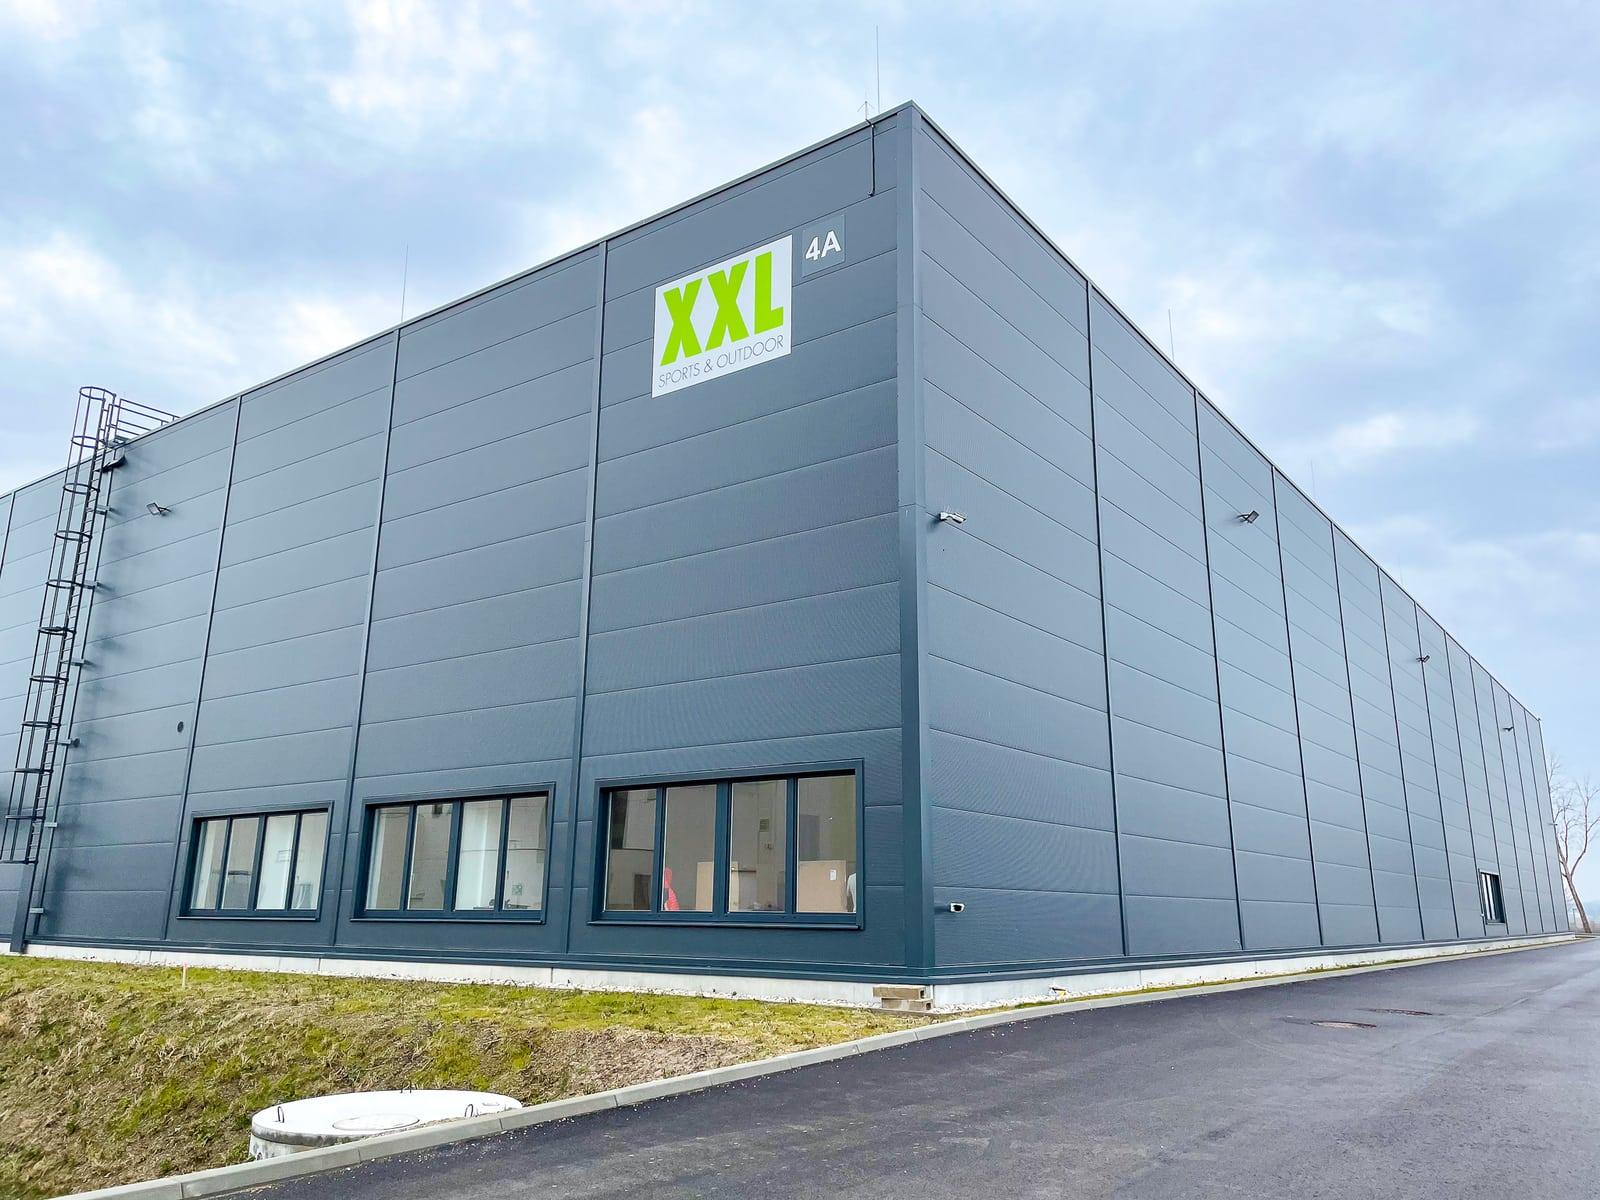 Central Warehouse Austria XXL gebouw van buitenaf